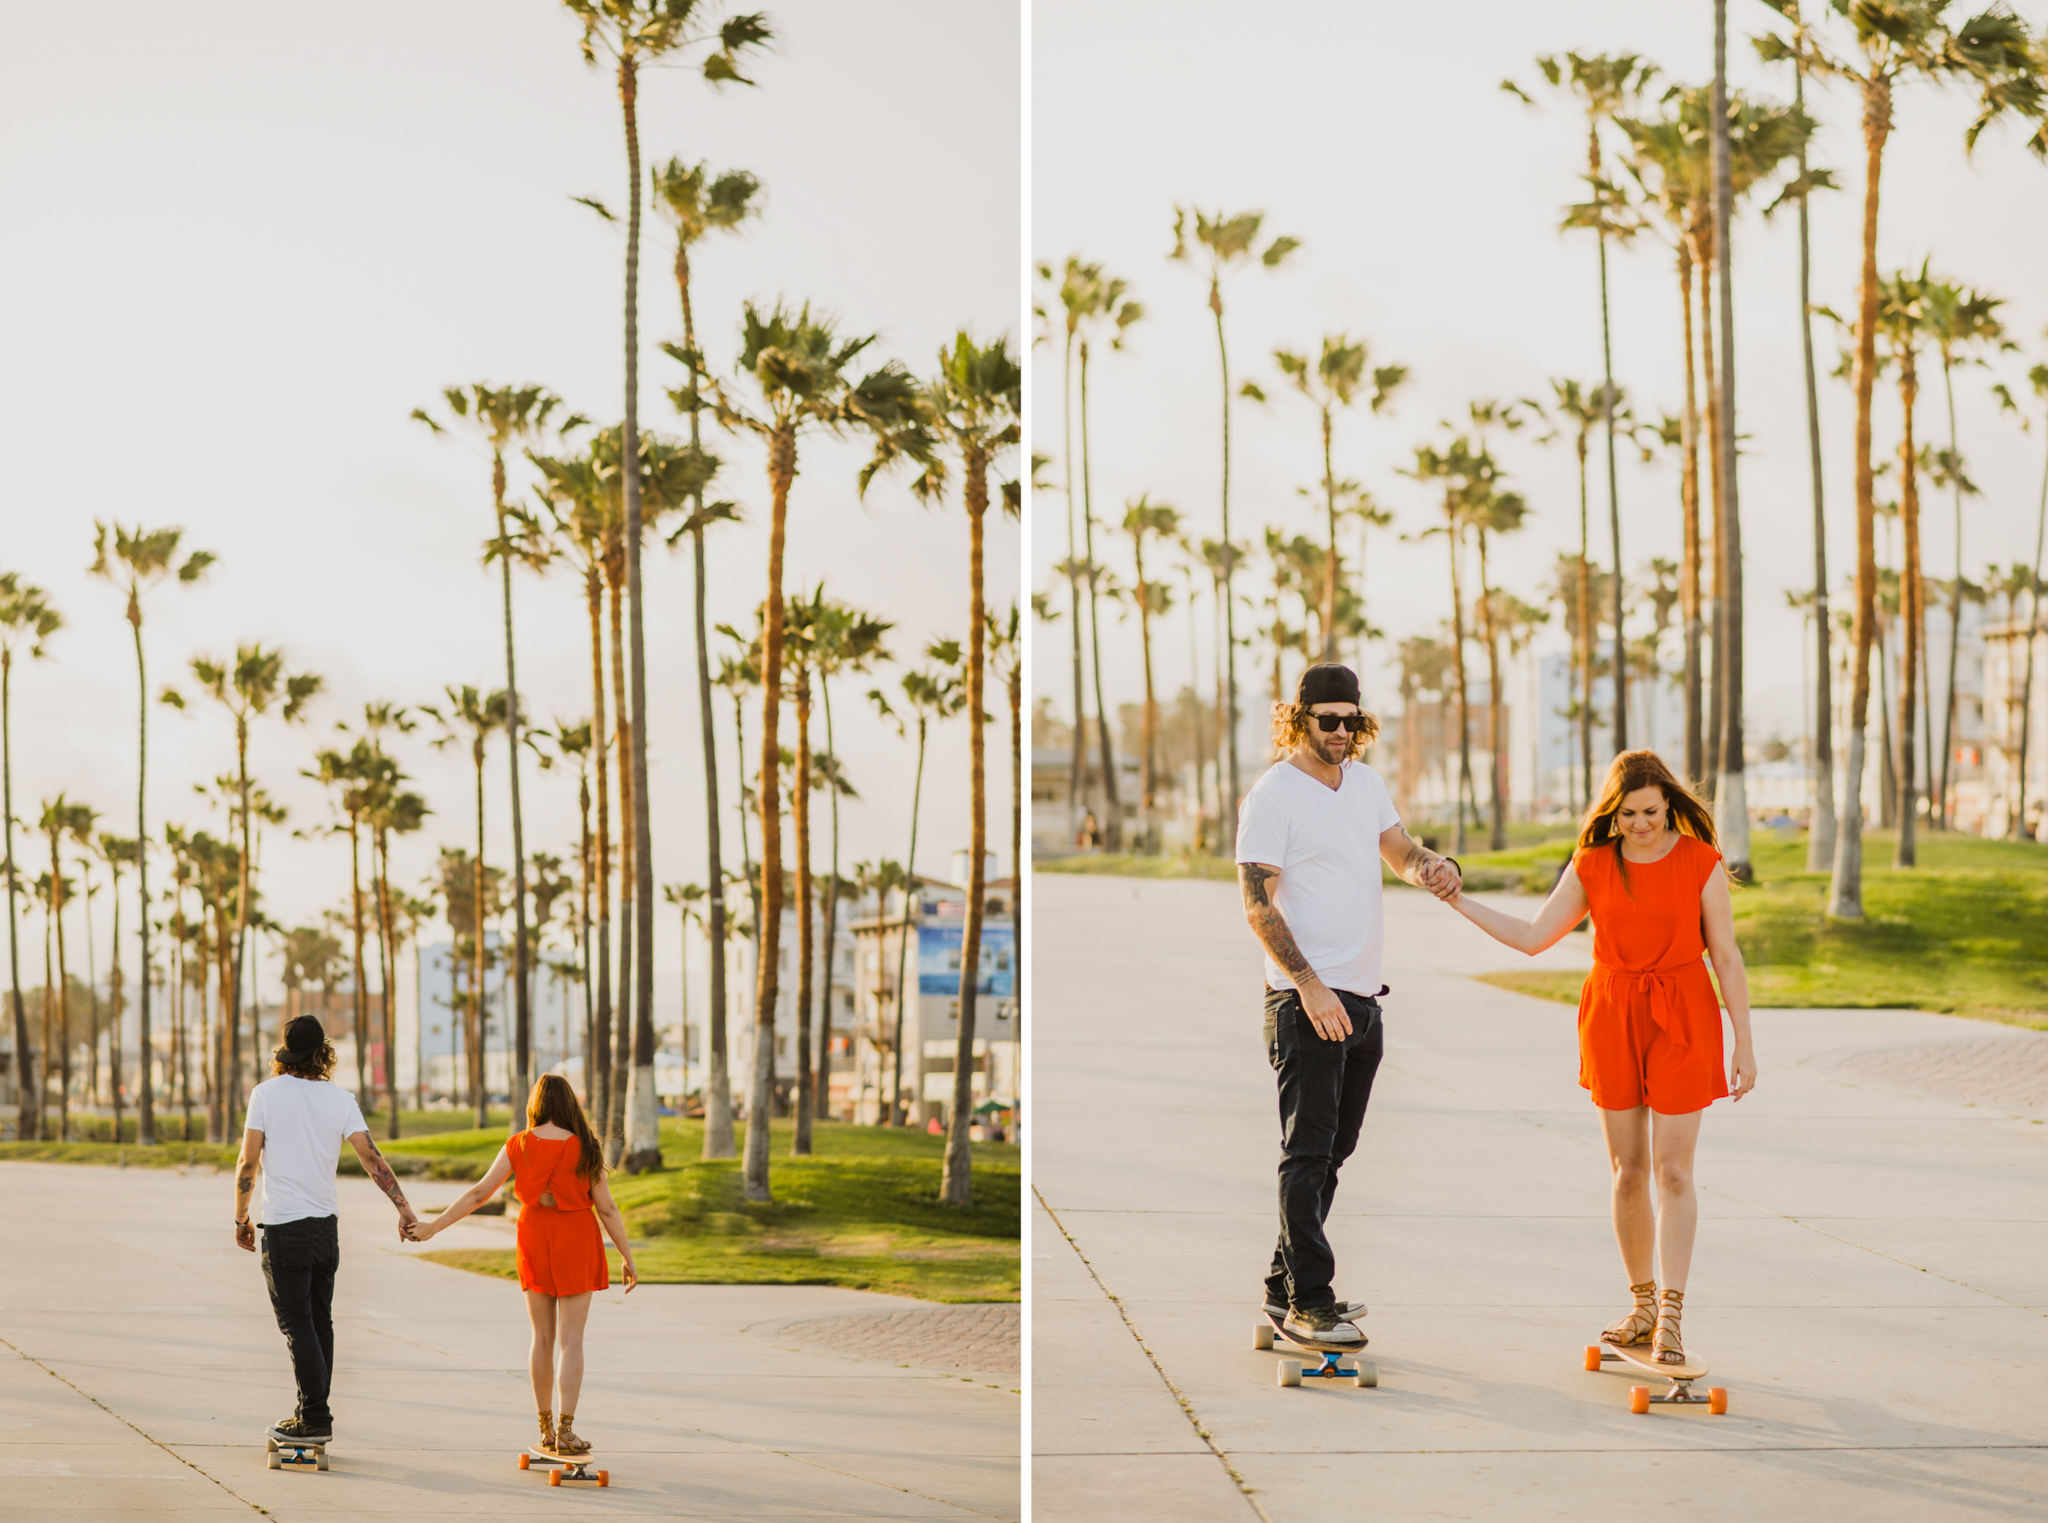 Isaiah Taylor Photography Skating Engagement Venice Beach